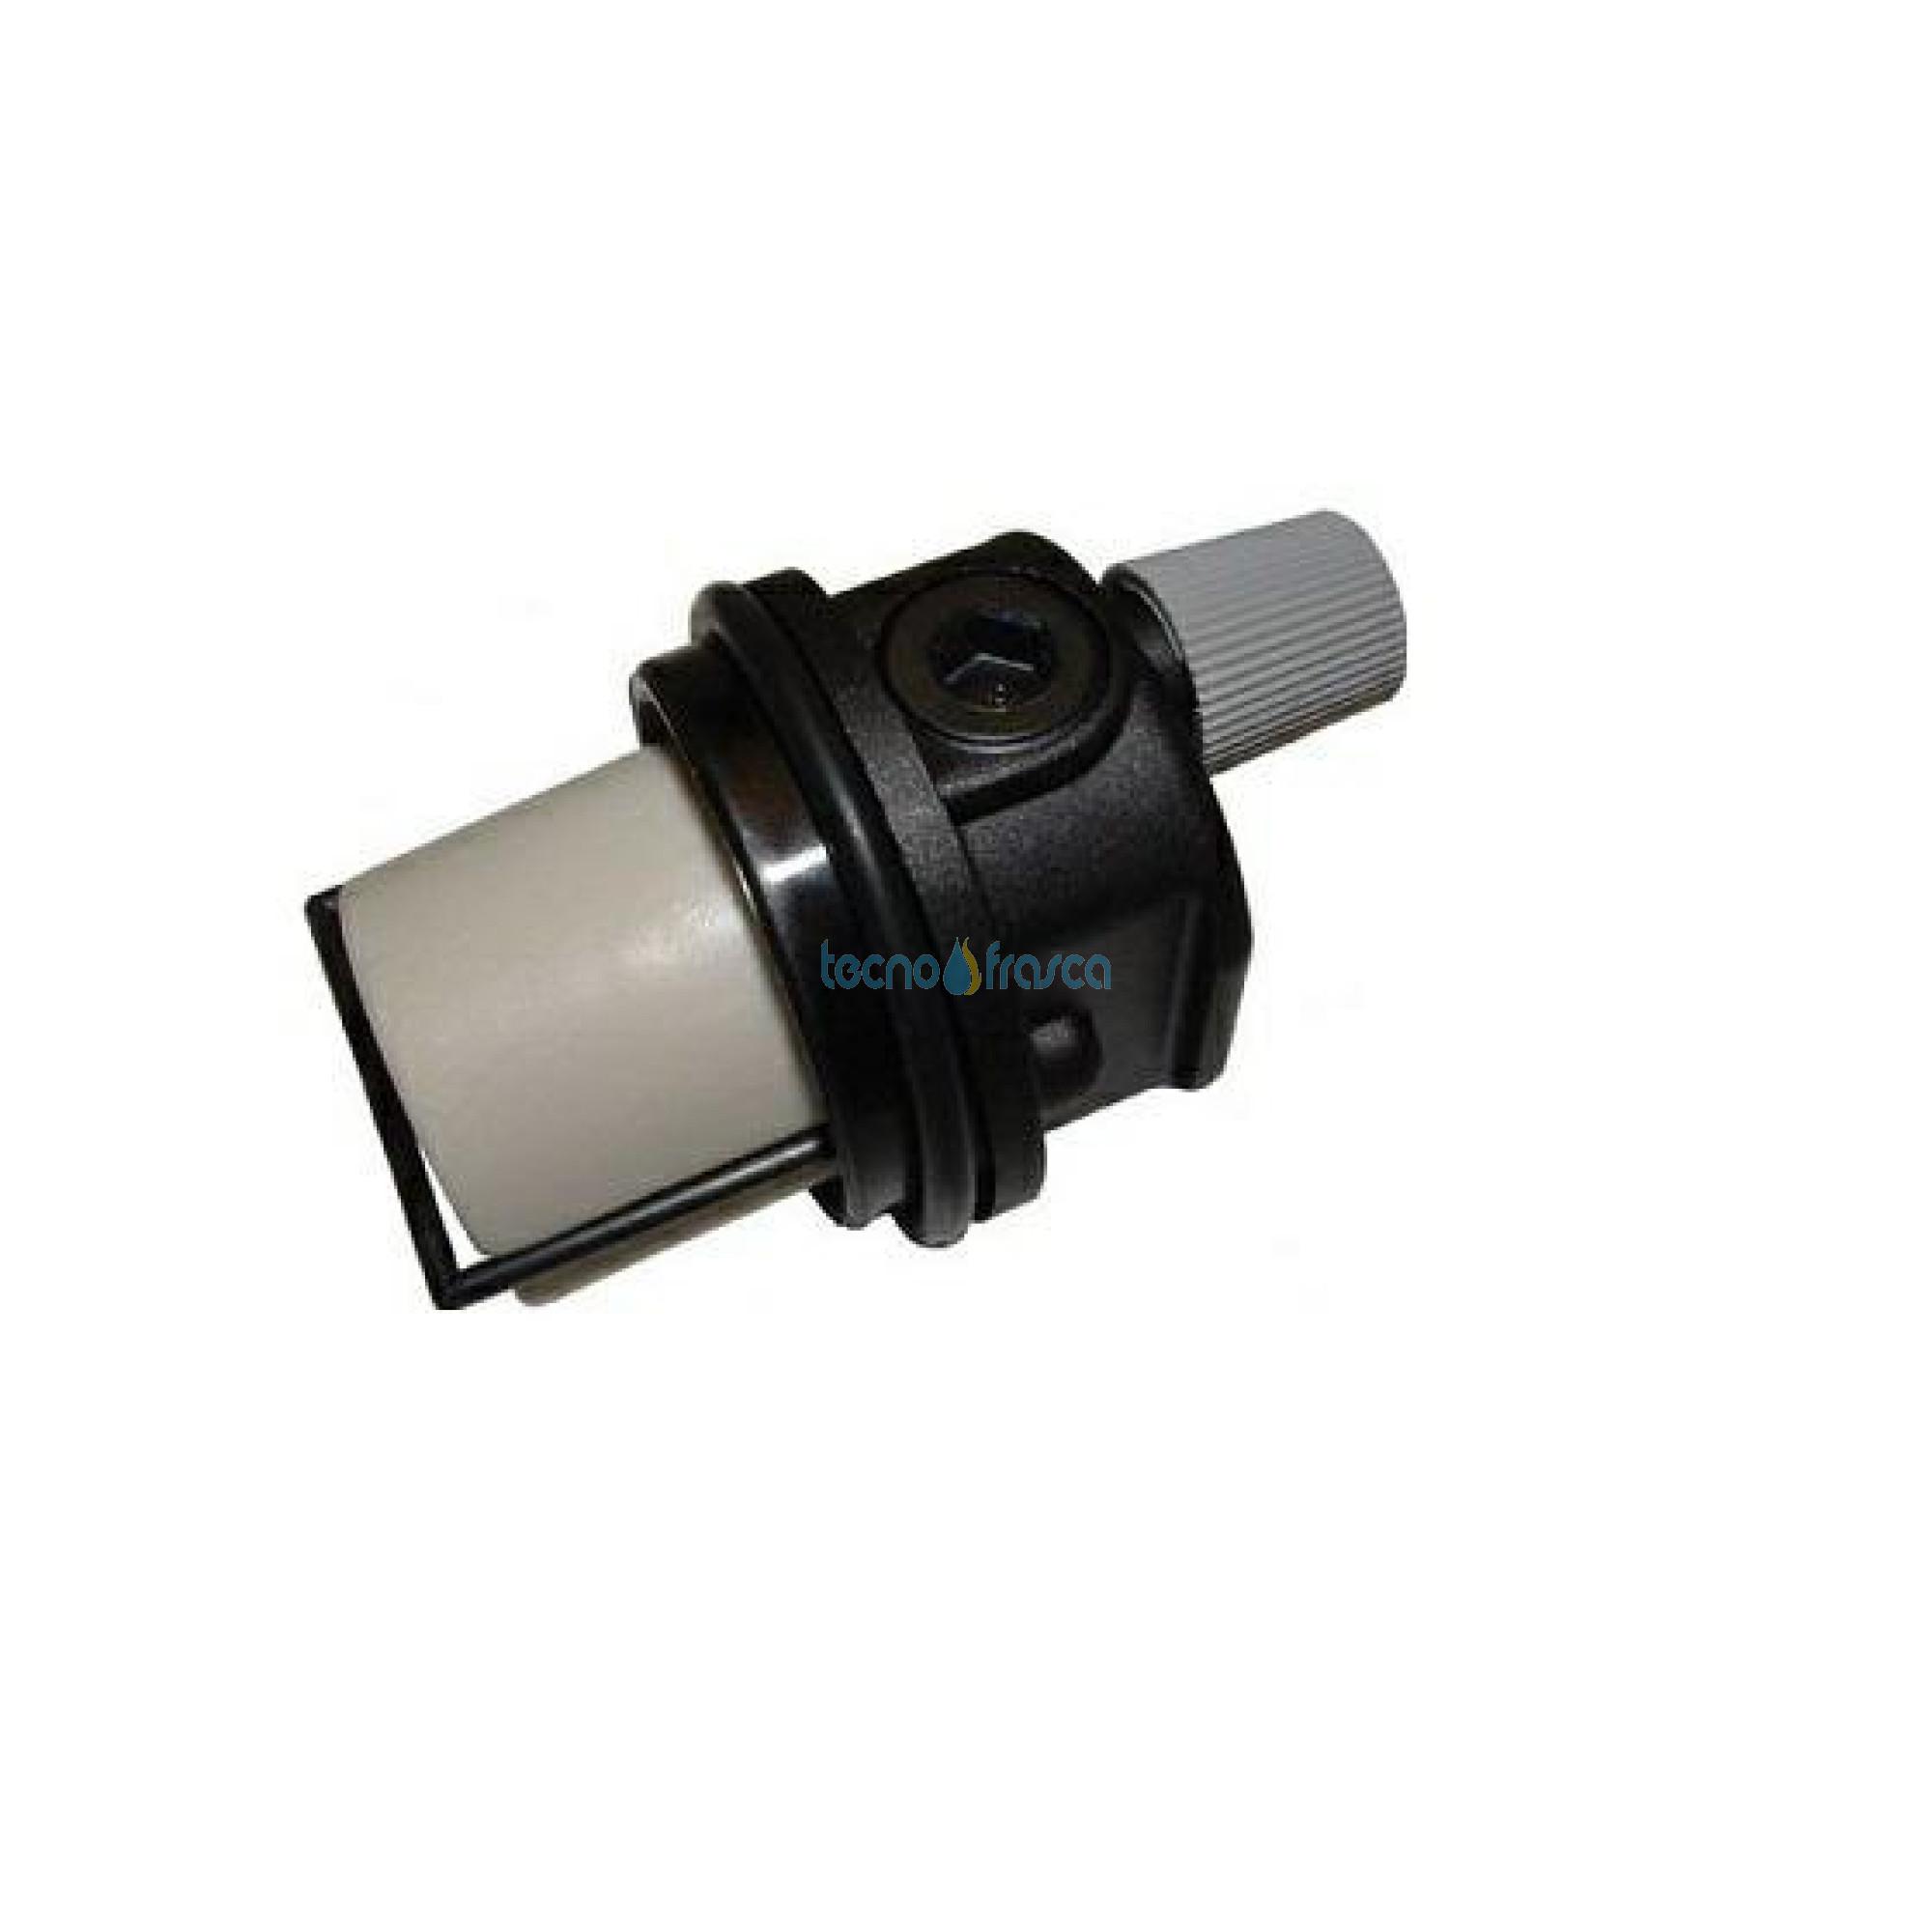 Immergas valvola sfogo aria per compact block 1.022102